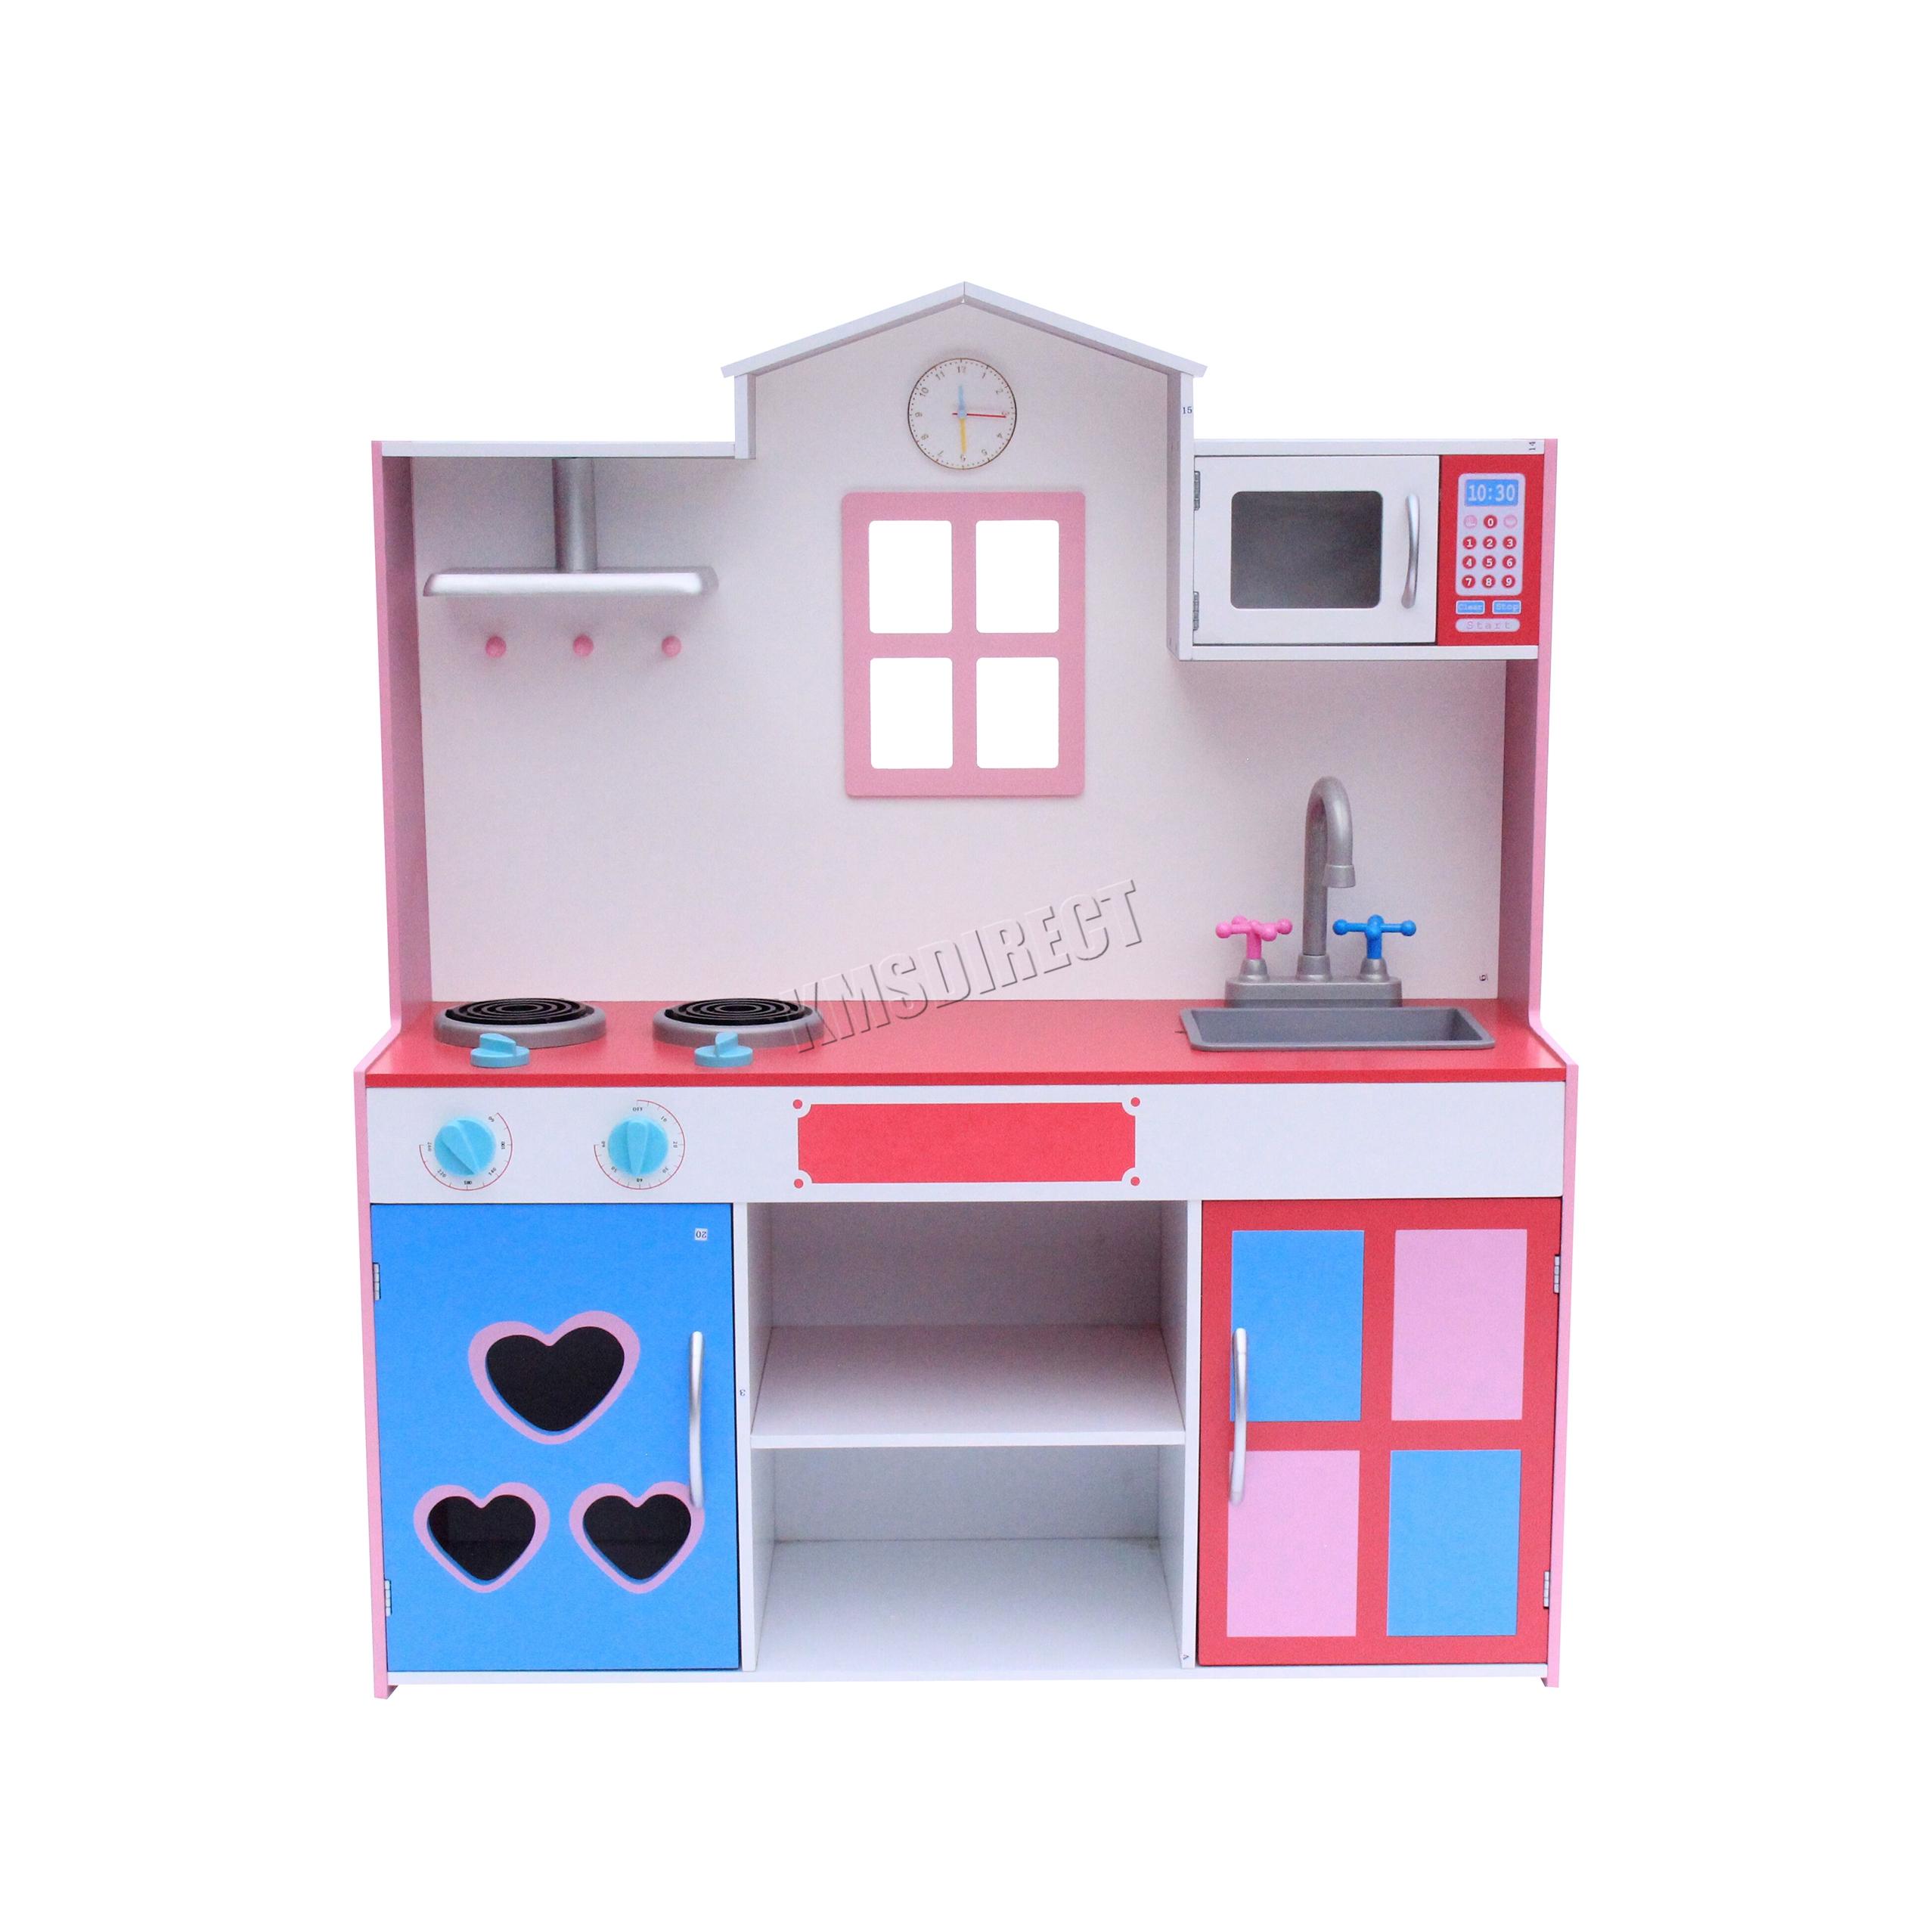 FoxHunter Large Wooden Kitchen Playset Toy Kids Children Cooking ...